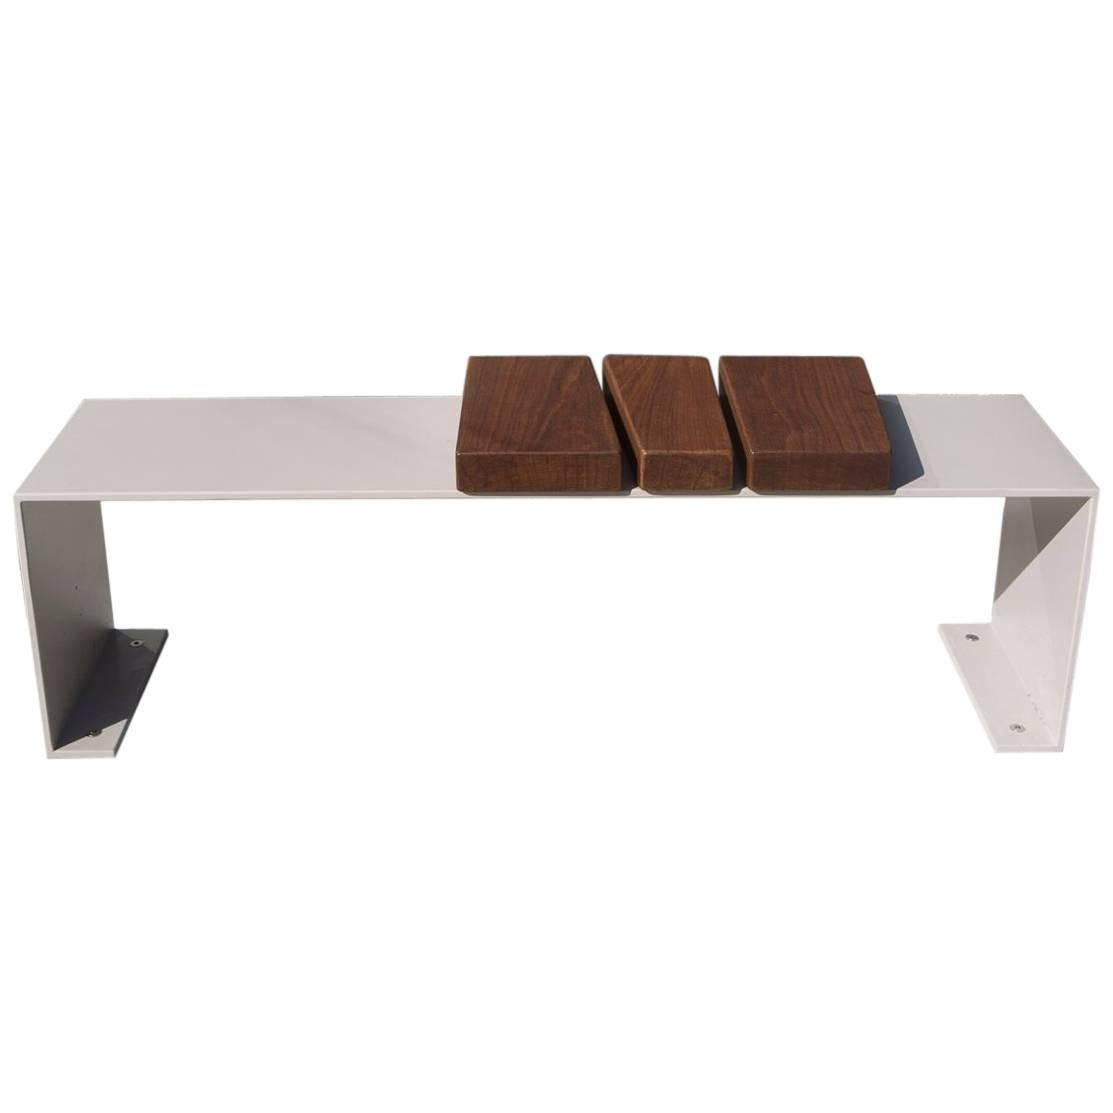 Minimal Aluminum and Ipe Indoor/Outdoor Bench Seating by Vivian Carbonell